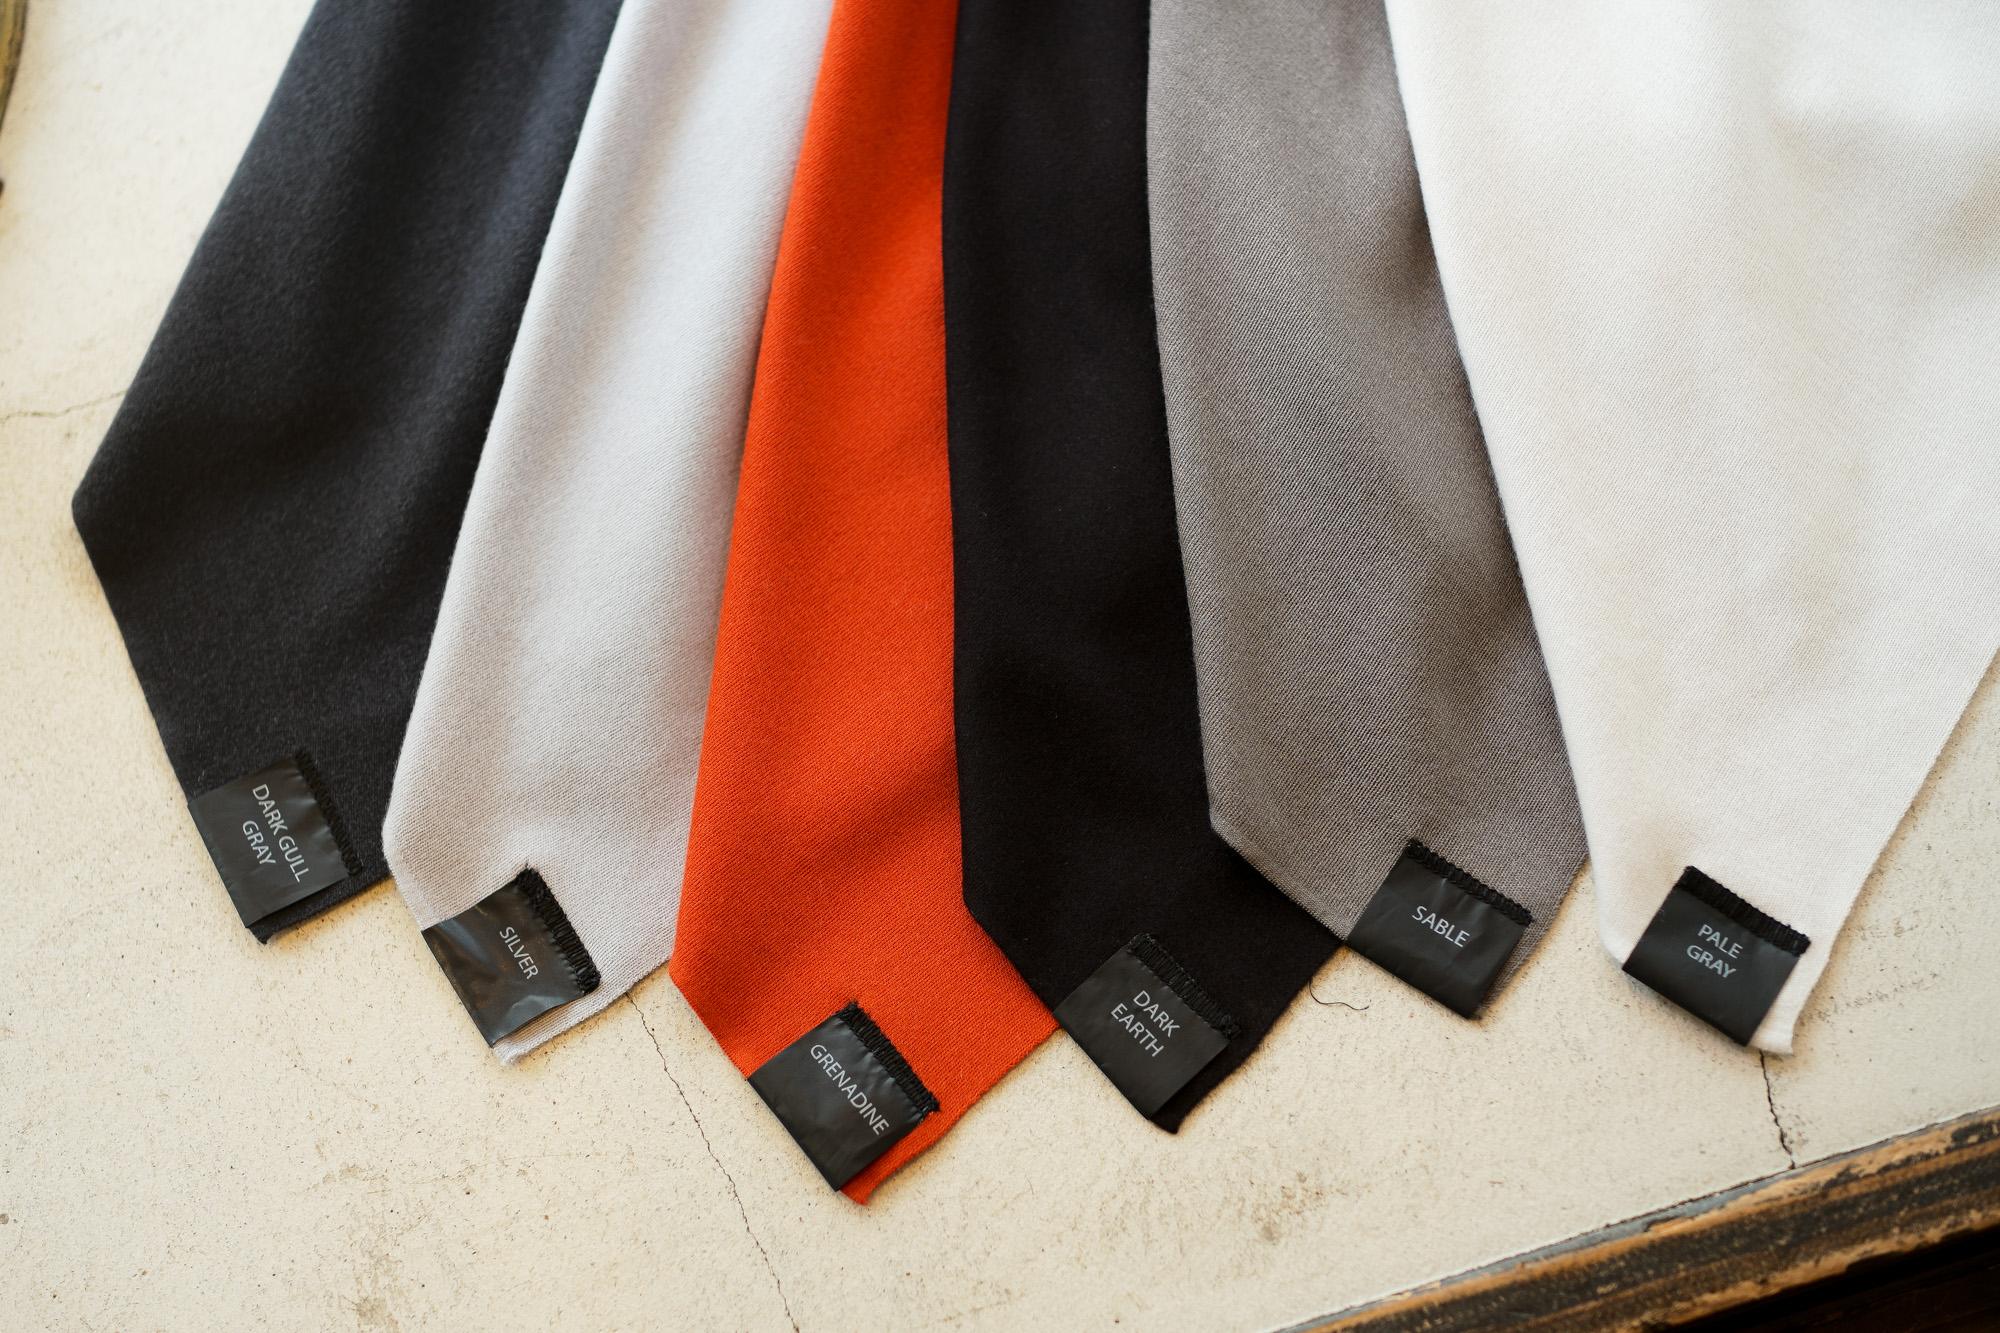 MANRICO CASHMERE (マンリコ カシミア) Summer Cashmere Polo Shirts (サマー カシミア ポロシャツ) サマー カシミヤ ポロシャツ made in italy (イタリア製) 2021 春夏 【ご予約開始】 愛知 名古屋 Alto e Diritto アルトエデリット